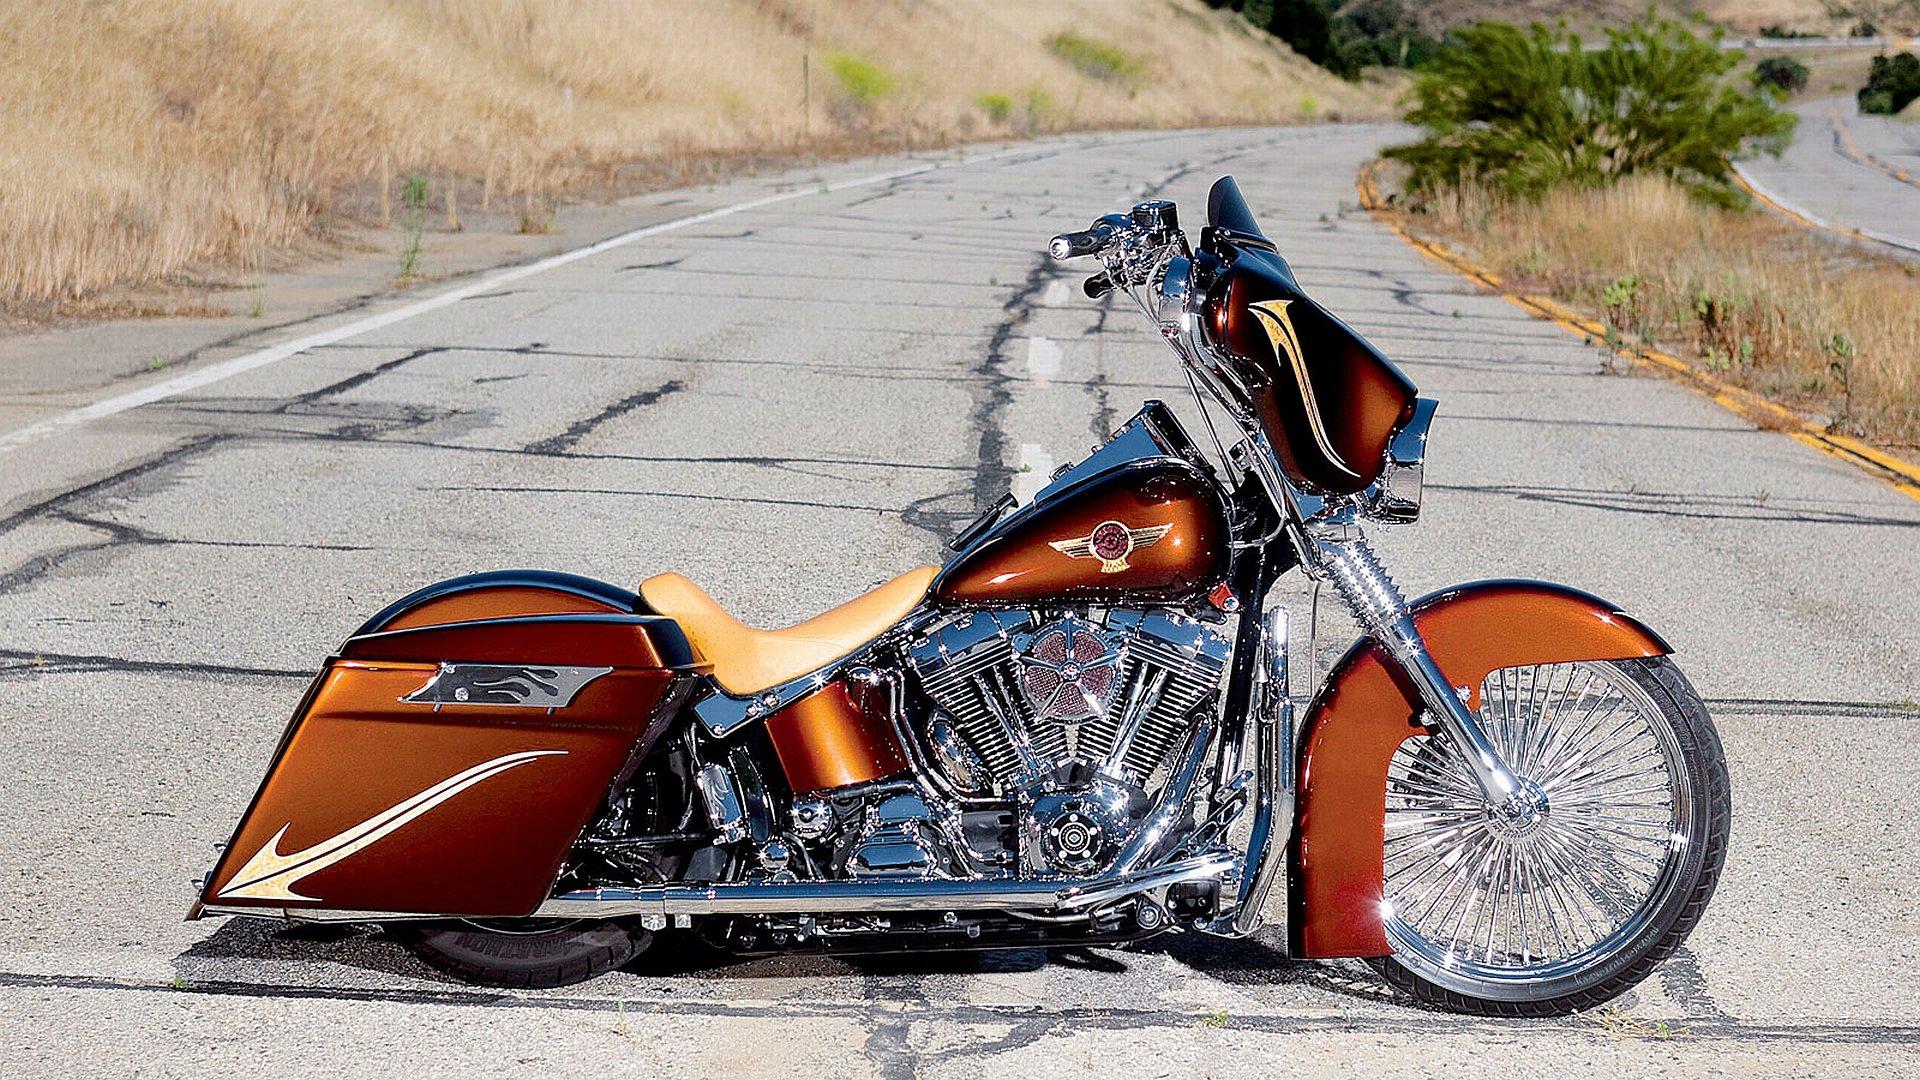 High Resolution Harley Davidson Hd 1920x1080 Wallpaper ID:478233 For Desktop